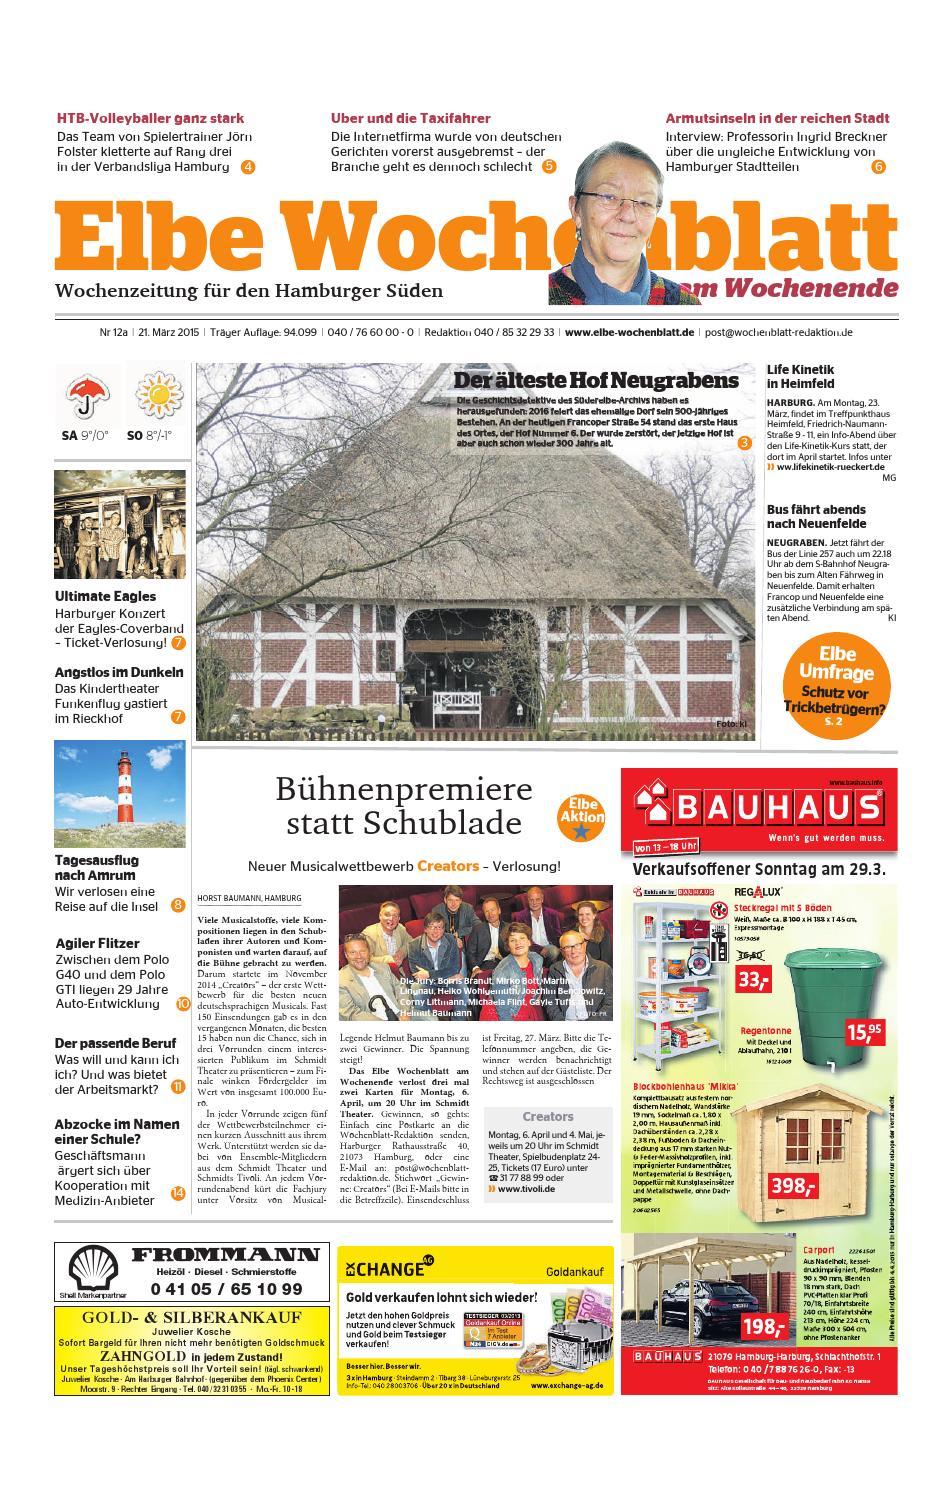 Wochenende KW12-2015 by Elbe Wochenblatt Verlagsgesellschaft mbH & Co.KG -  issuu